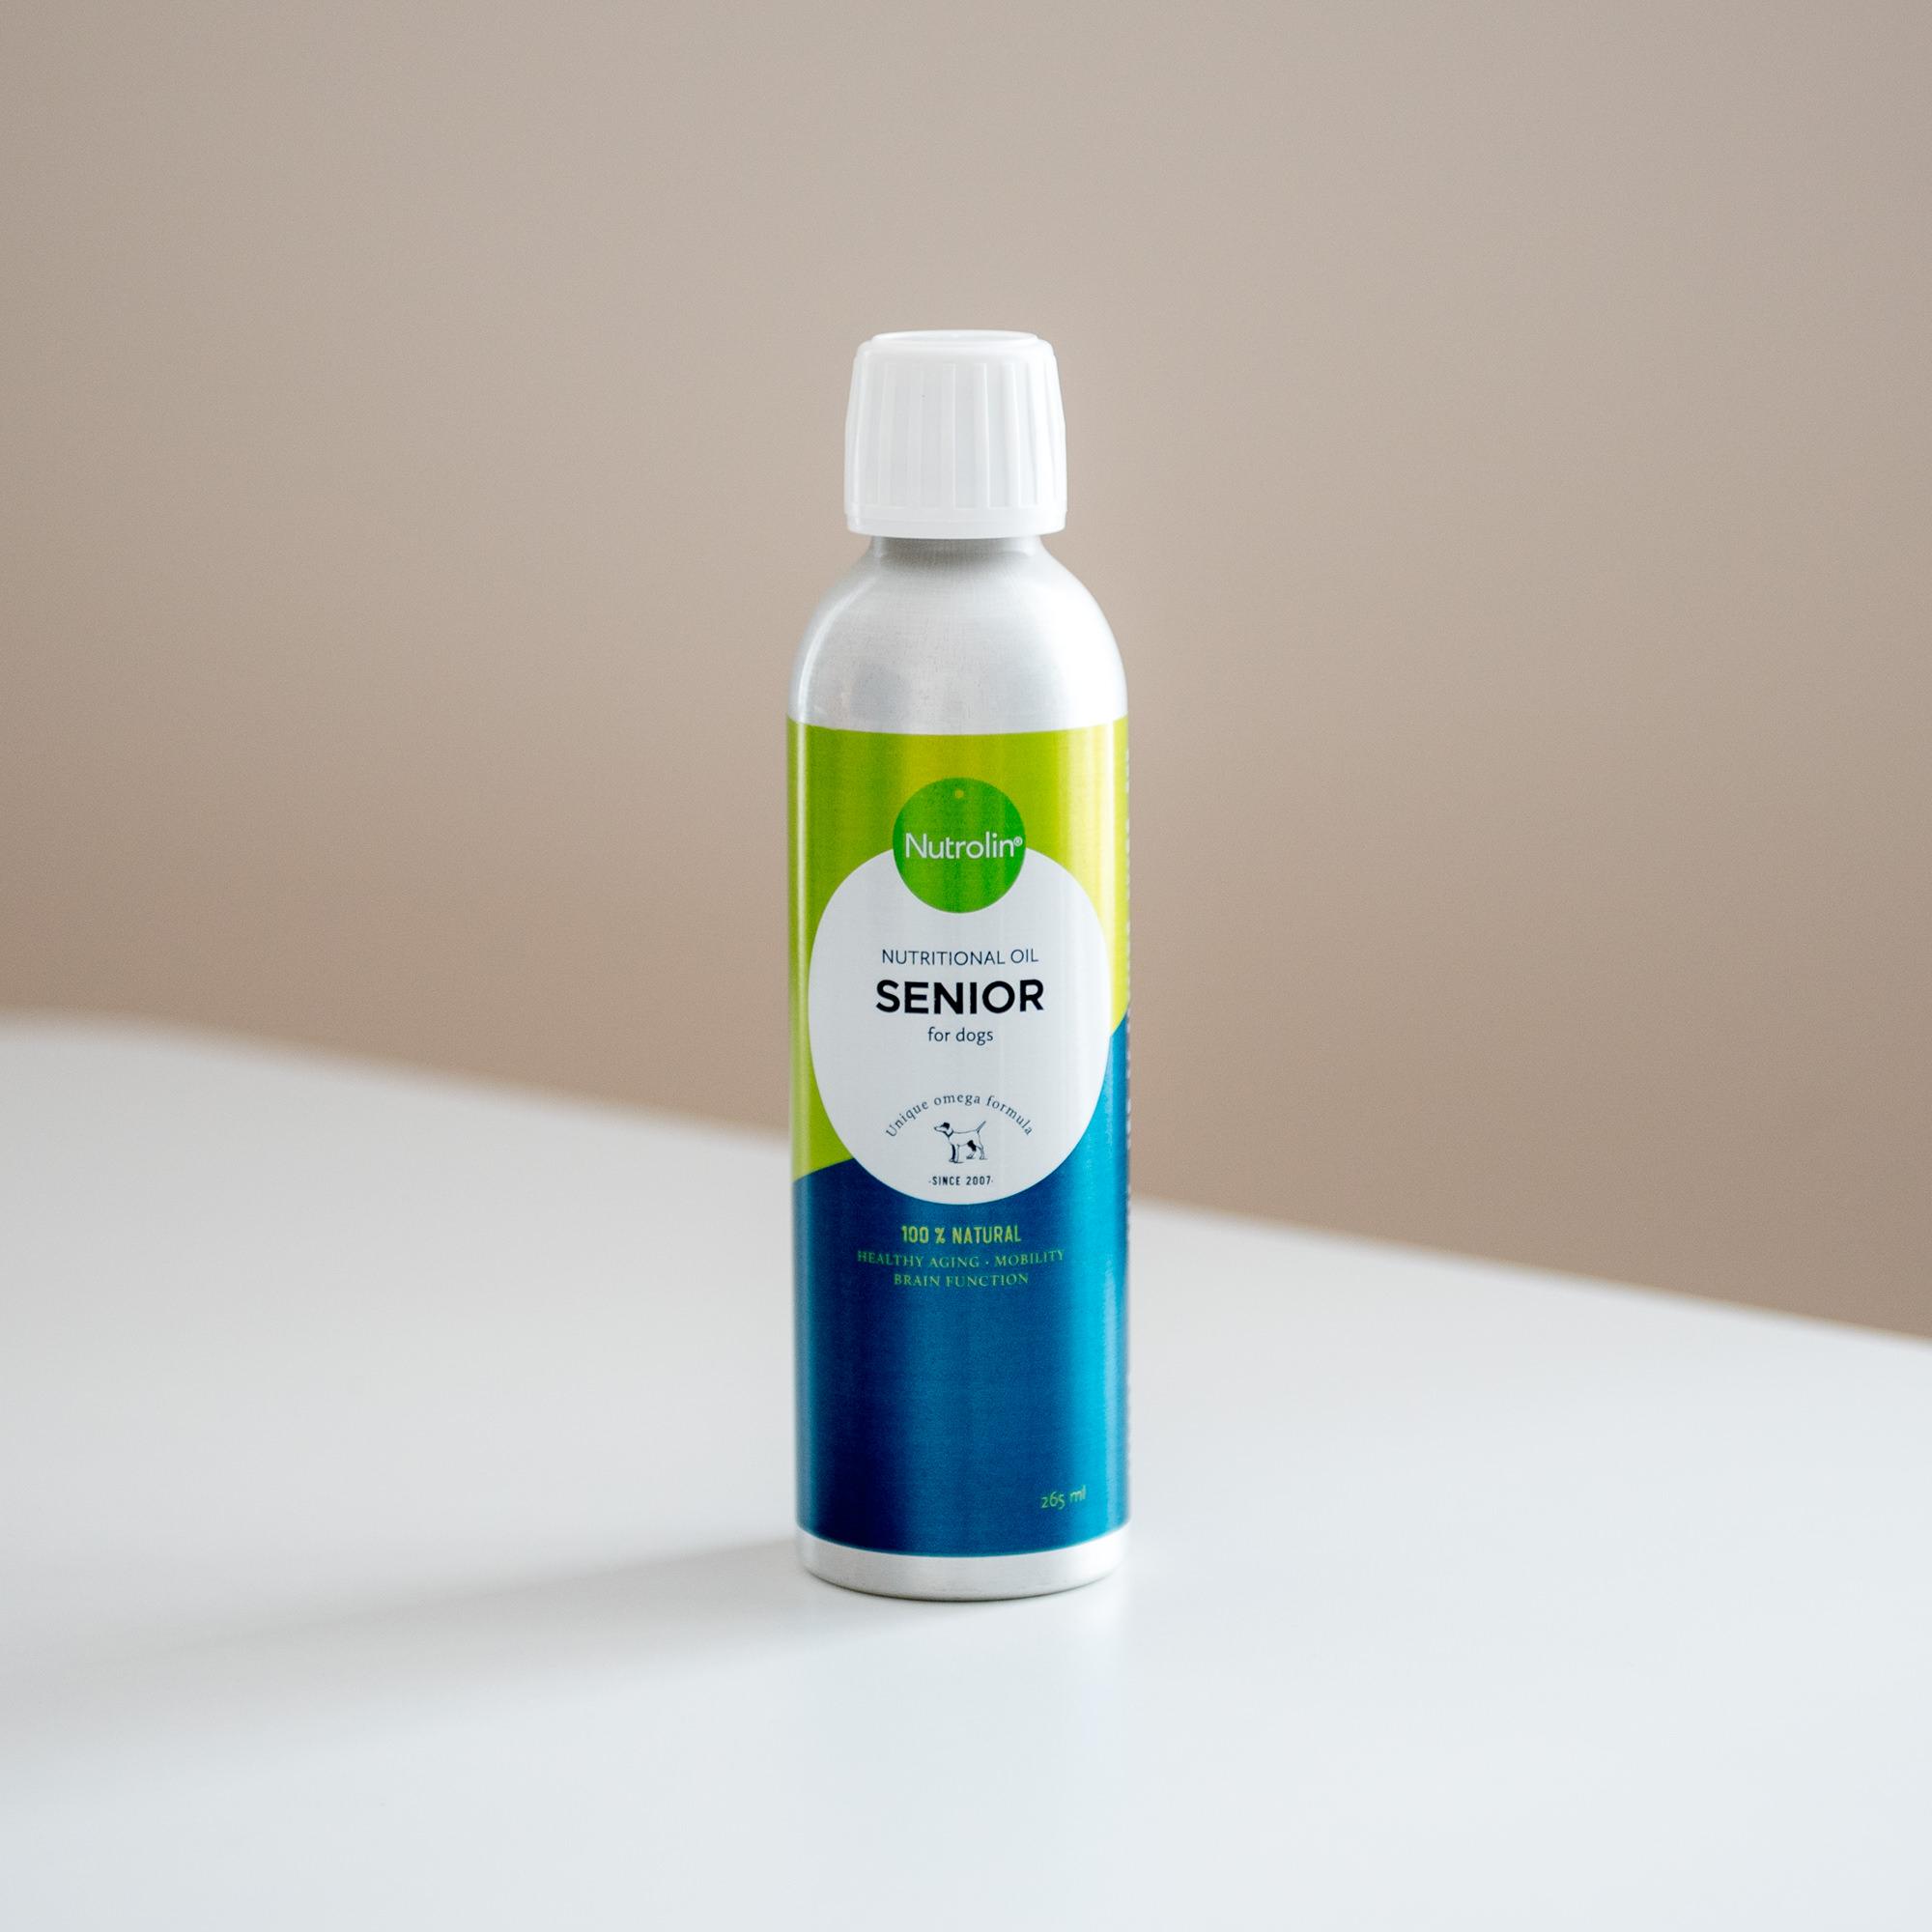 Nutrolin® Senior - 265 ml